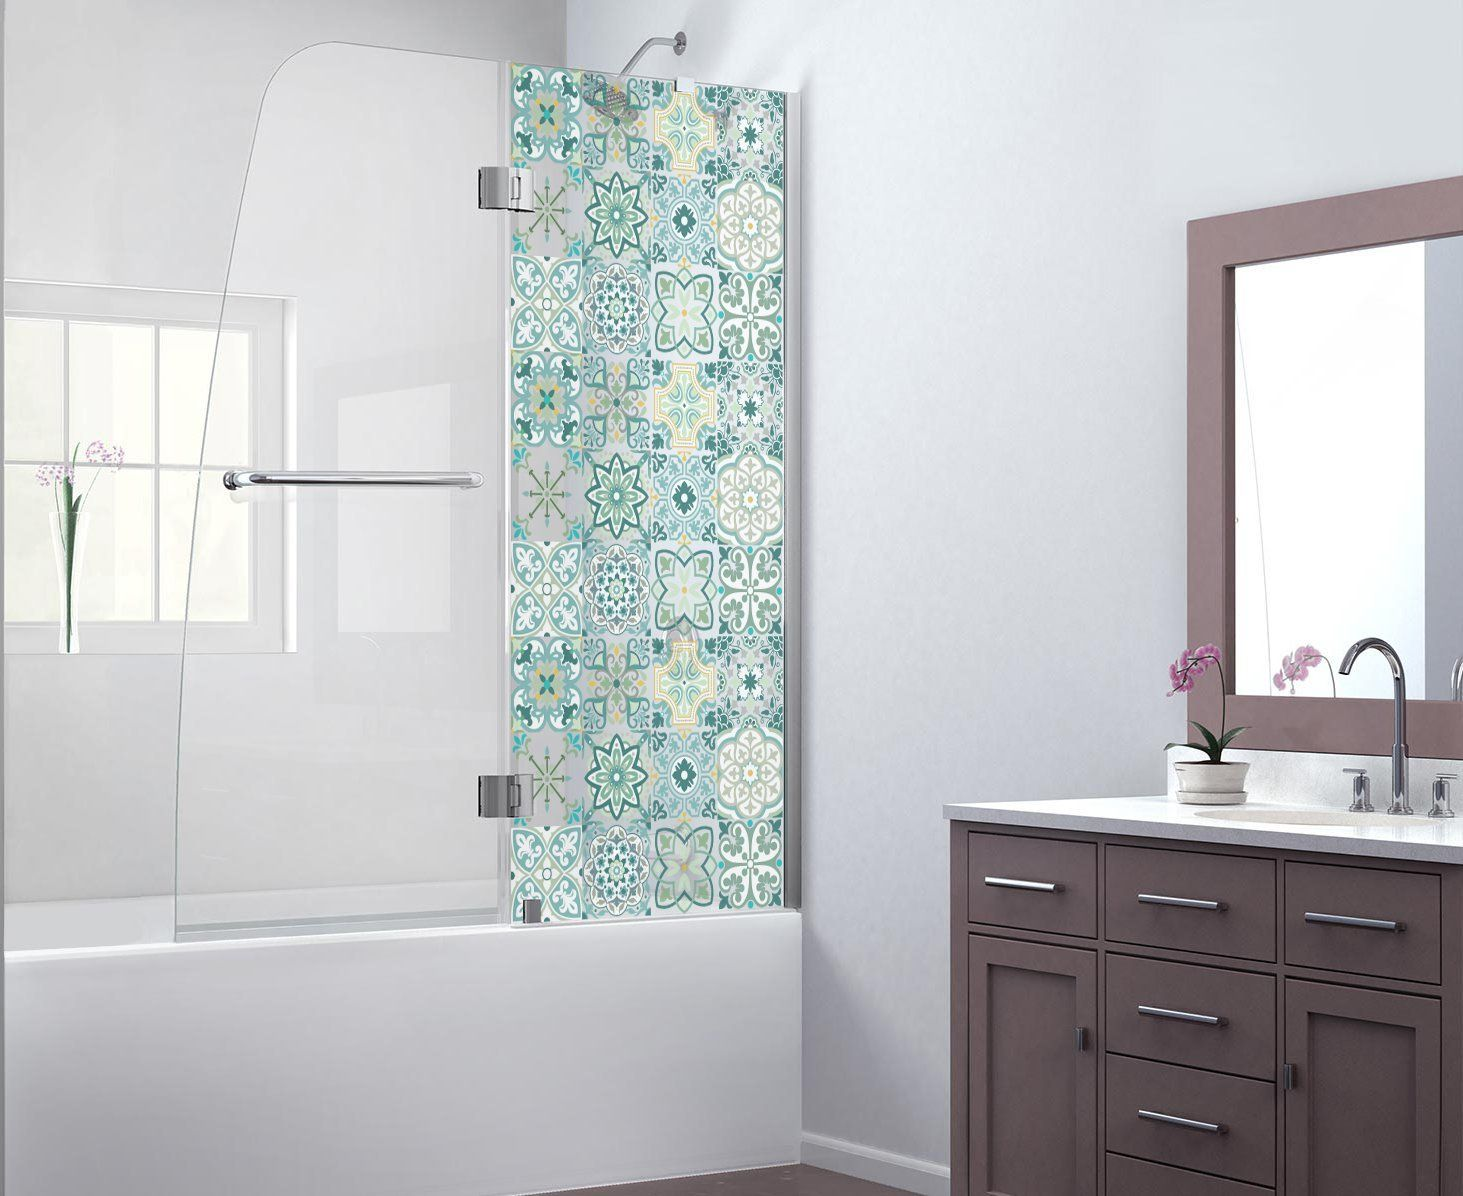 Amazon.com: AMAZONAS Transparent Decorative Tile Stickers Set 12 ...